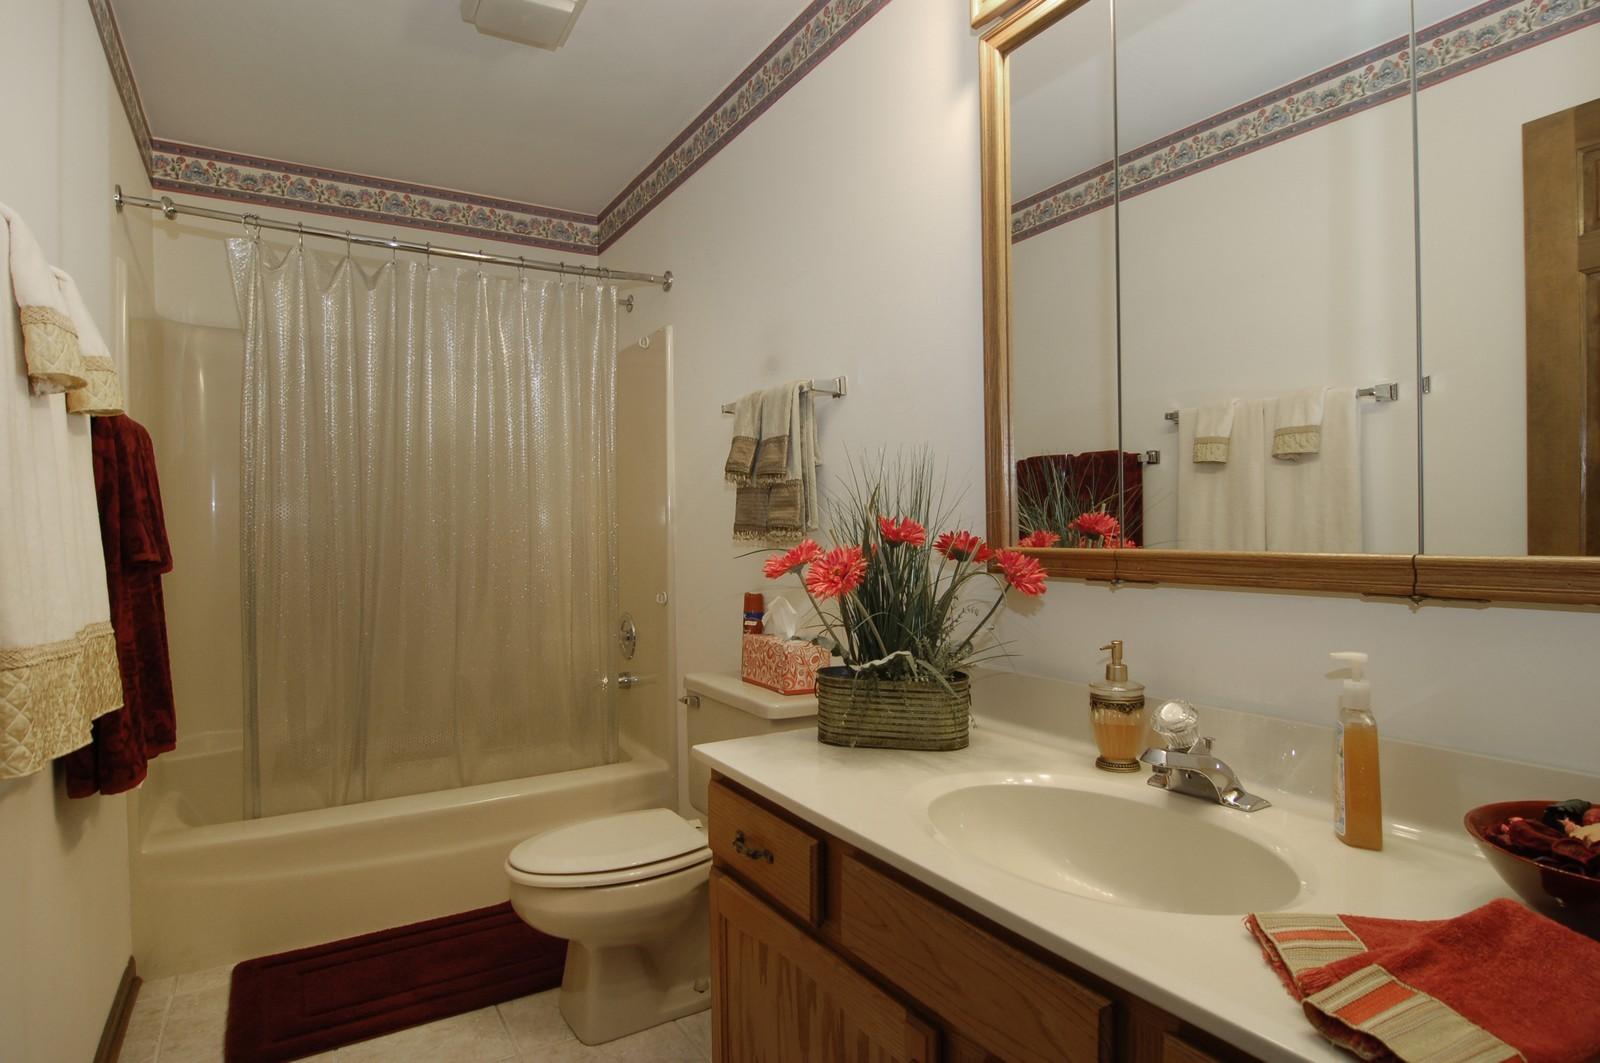 Real Estate Photography - 900 Saddlewood Dr, Glen Ellyn, IL, 60137 - Bathroom